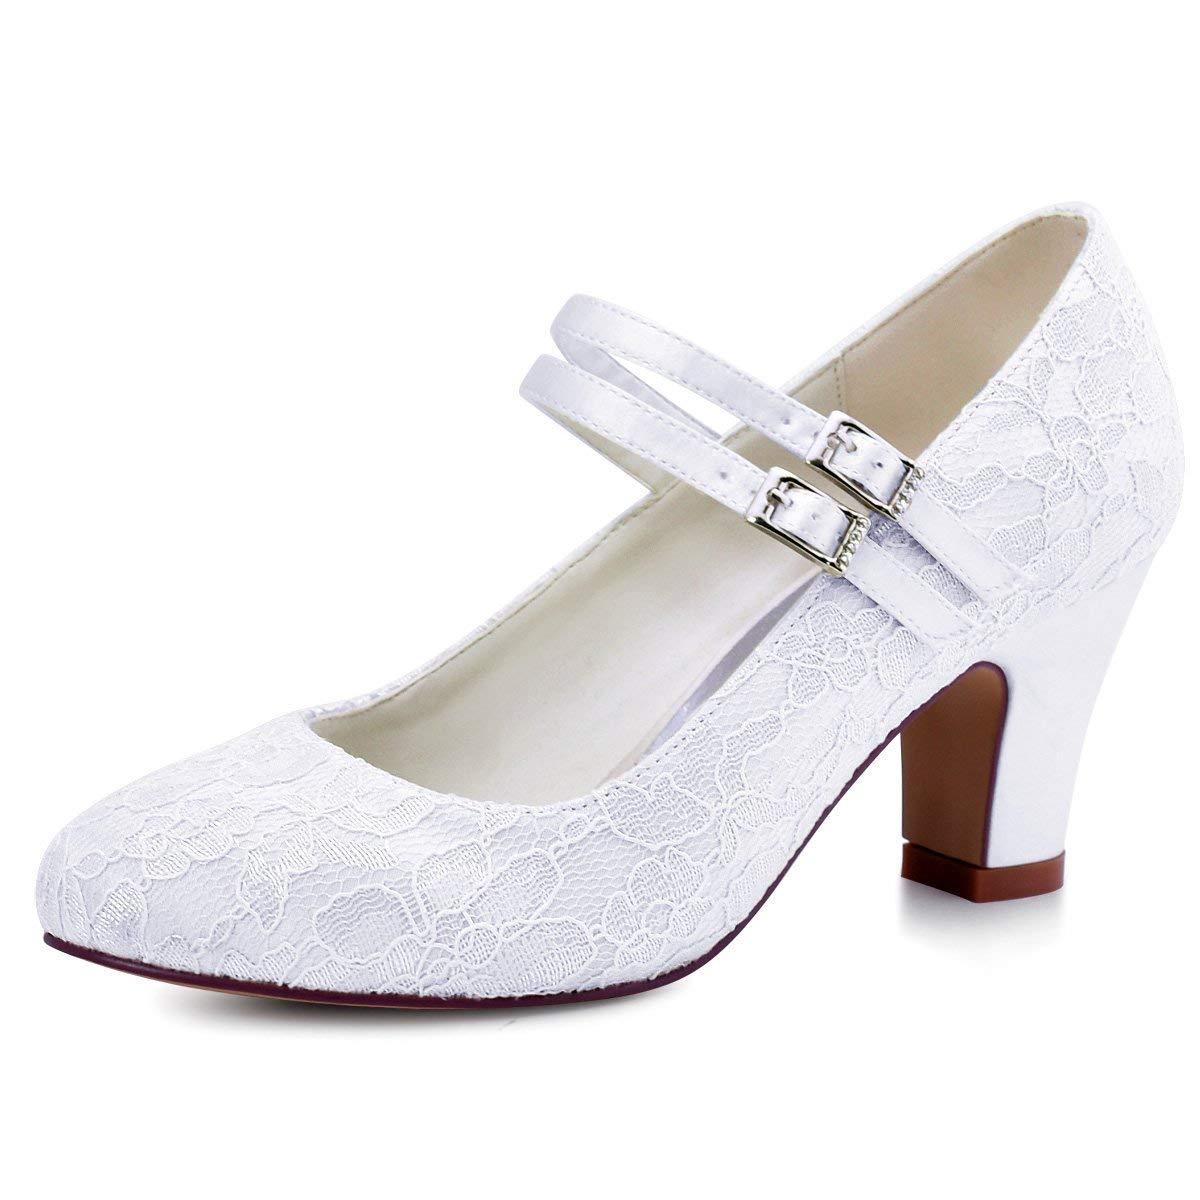 15ef03ef6 Get Quotations · ElegantPark HC1708 Women Mary Jane Block Heel Pumps Closed  Toe Lace Bridal Wedding Shoes